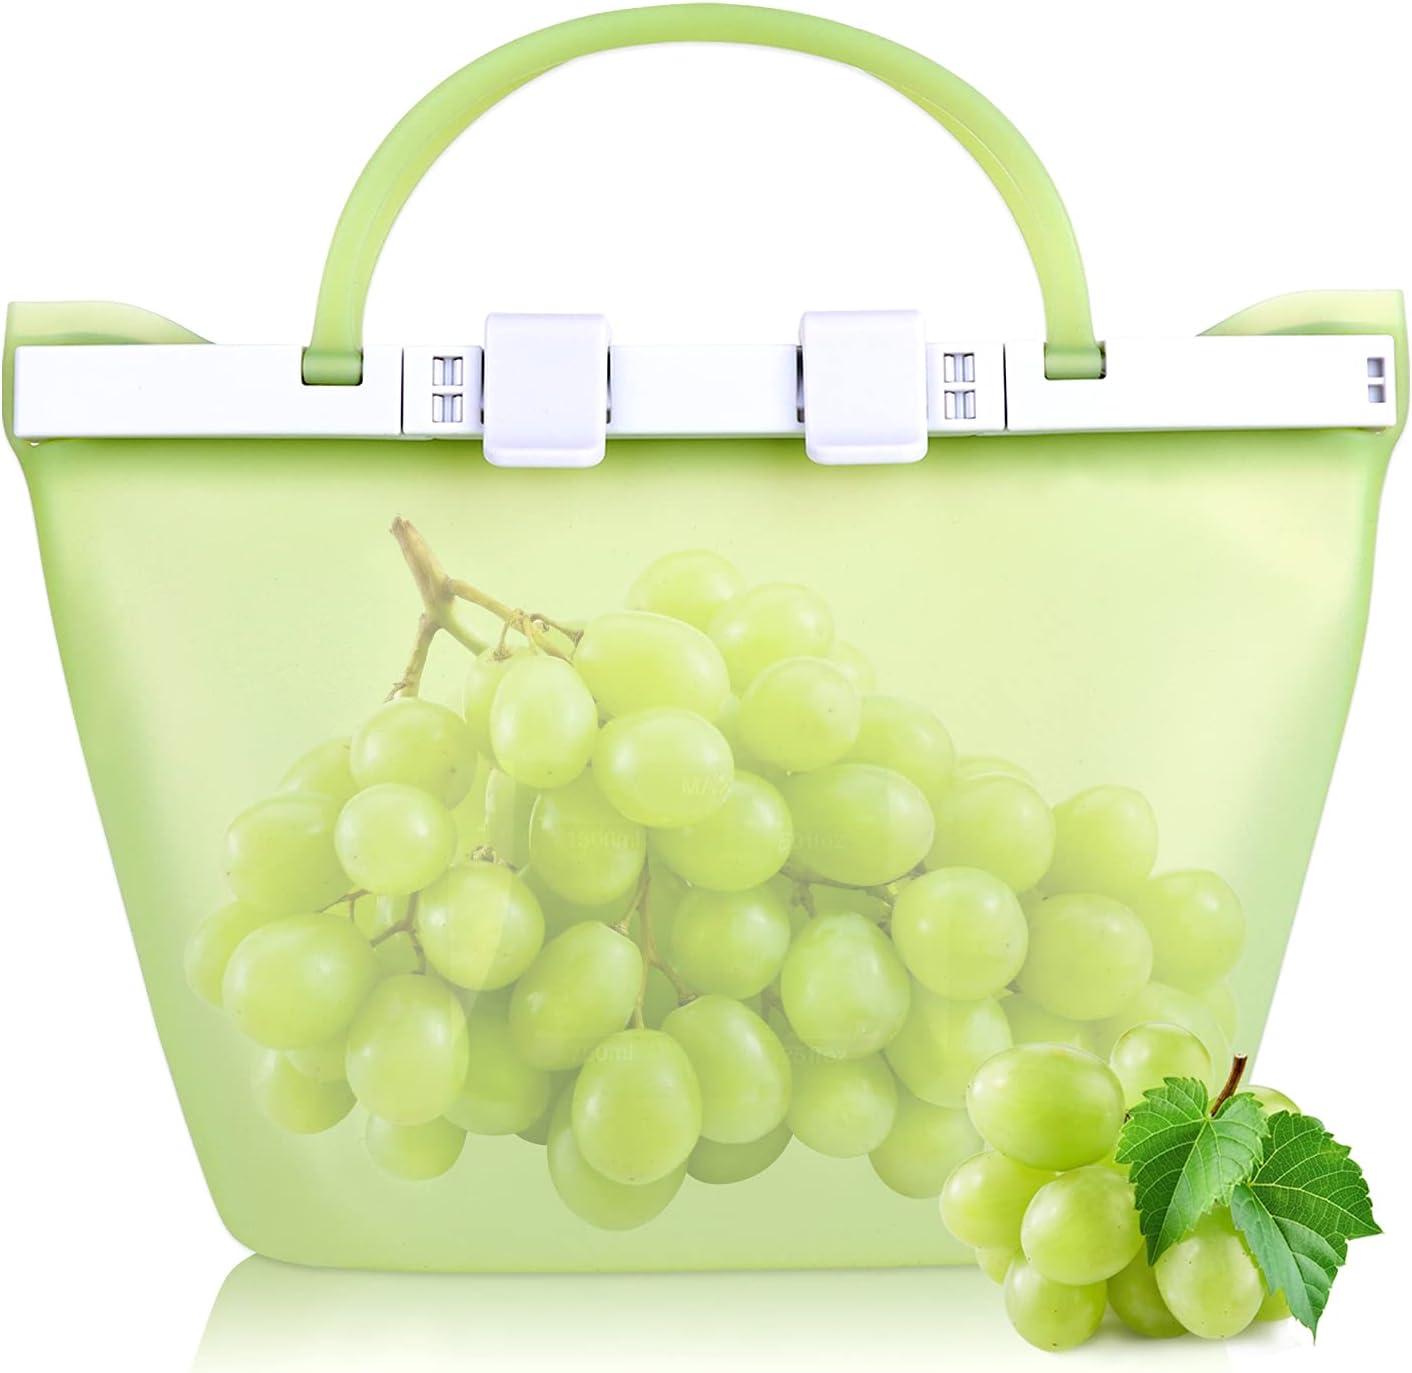 SANEIYA Reusable Silicone Food Storage Bags, Portable Leak-proof Silicone Reusable Food Bag For Refrigerator, Standable Silicone Bags For Food Storage, Dishwasher Safe, Eco-friendly (1500ml)